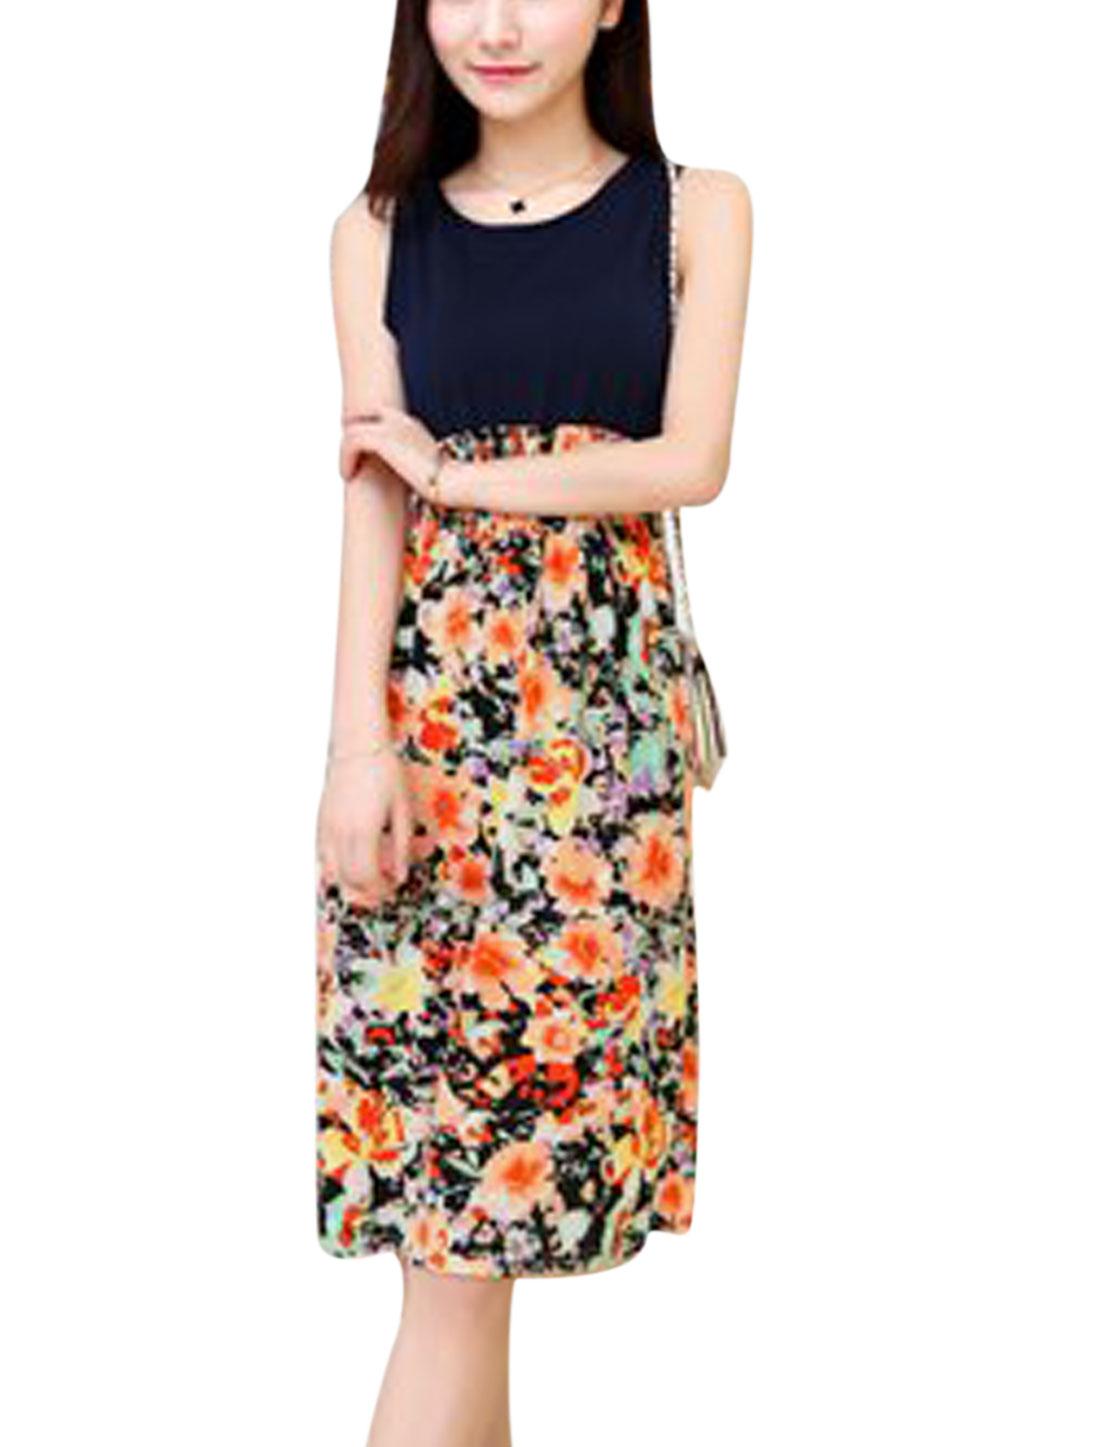 Woman Floral Prints Sleeveless Elastic Waist Summer Dress Navy Blue XS